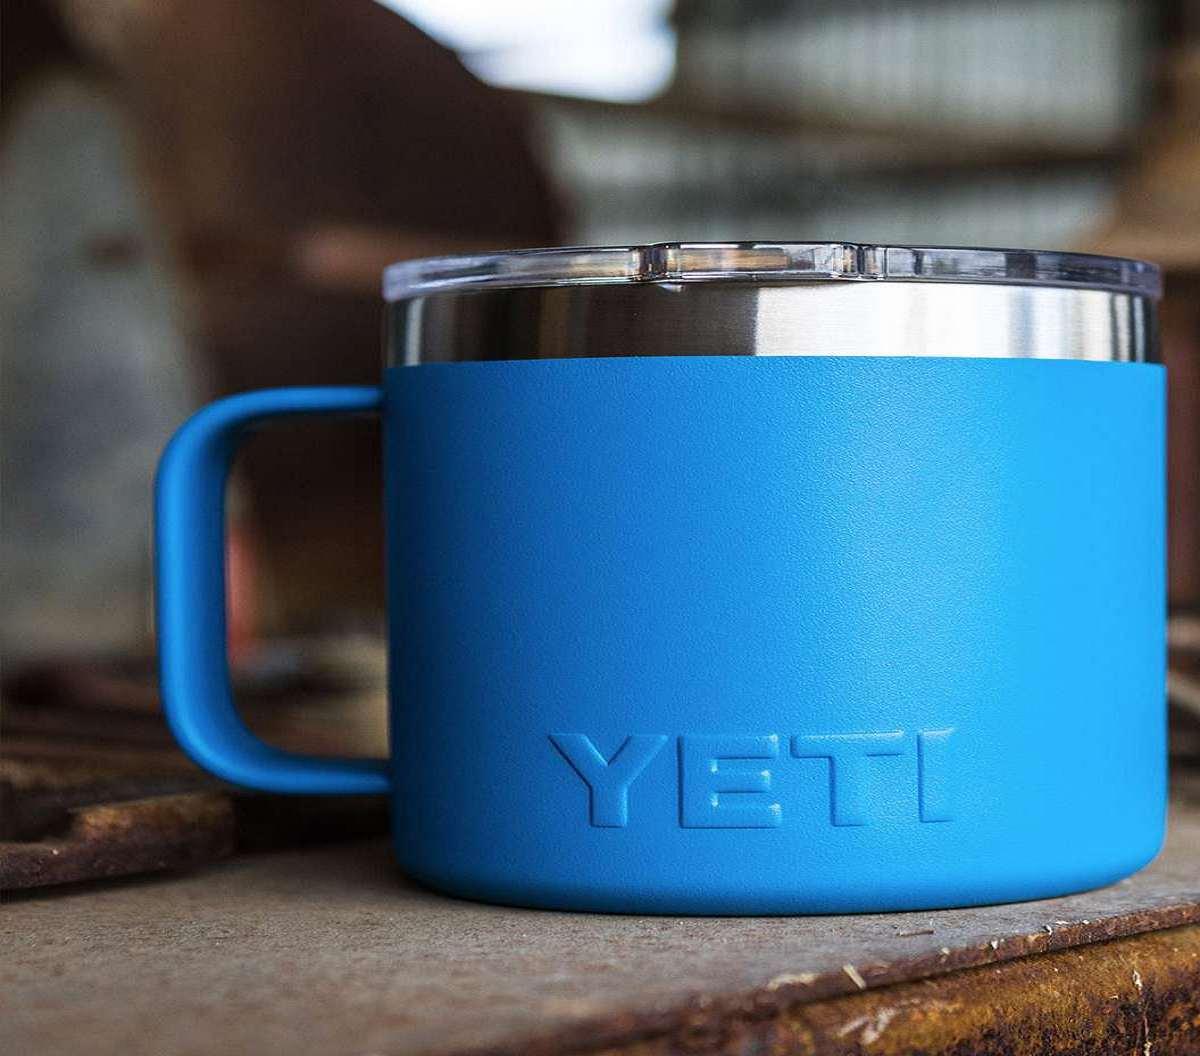 Oz Stainless Steel Travel Mug